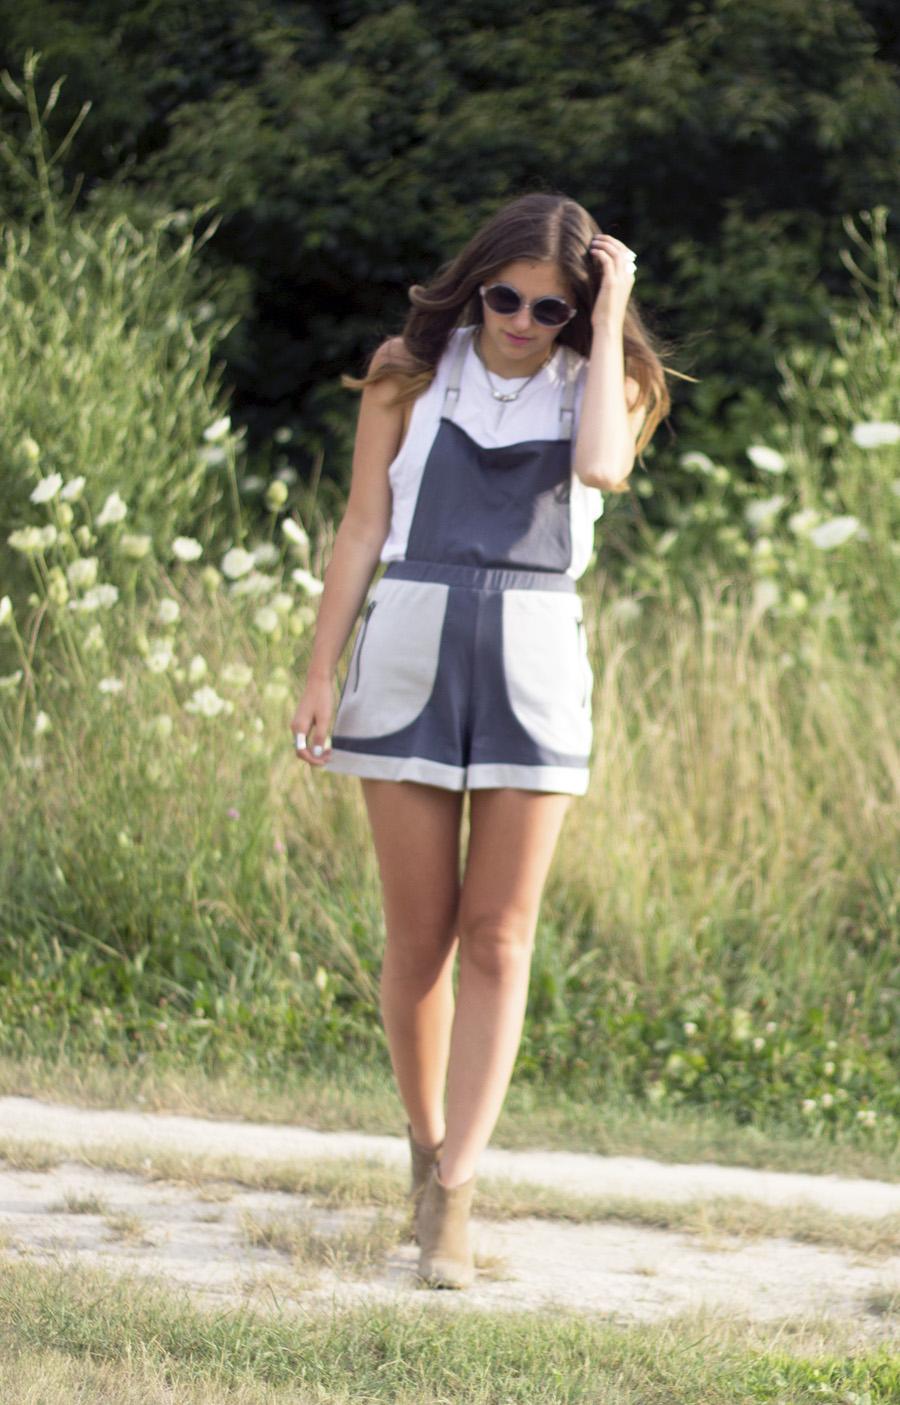 overalls shorts shortalls